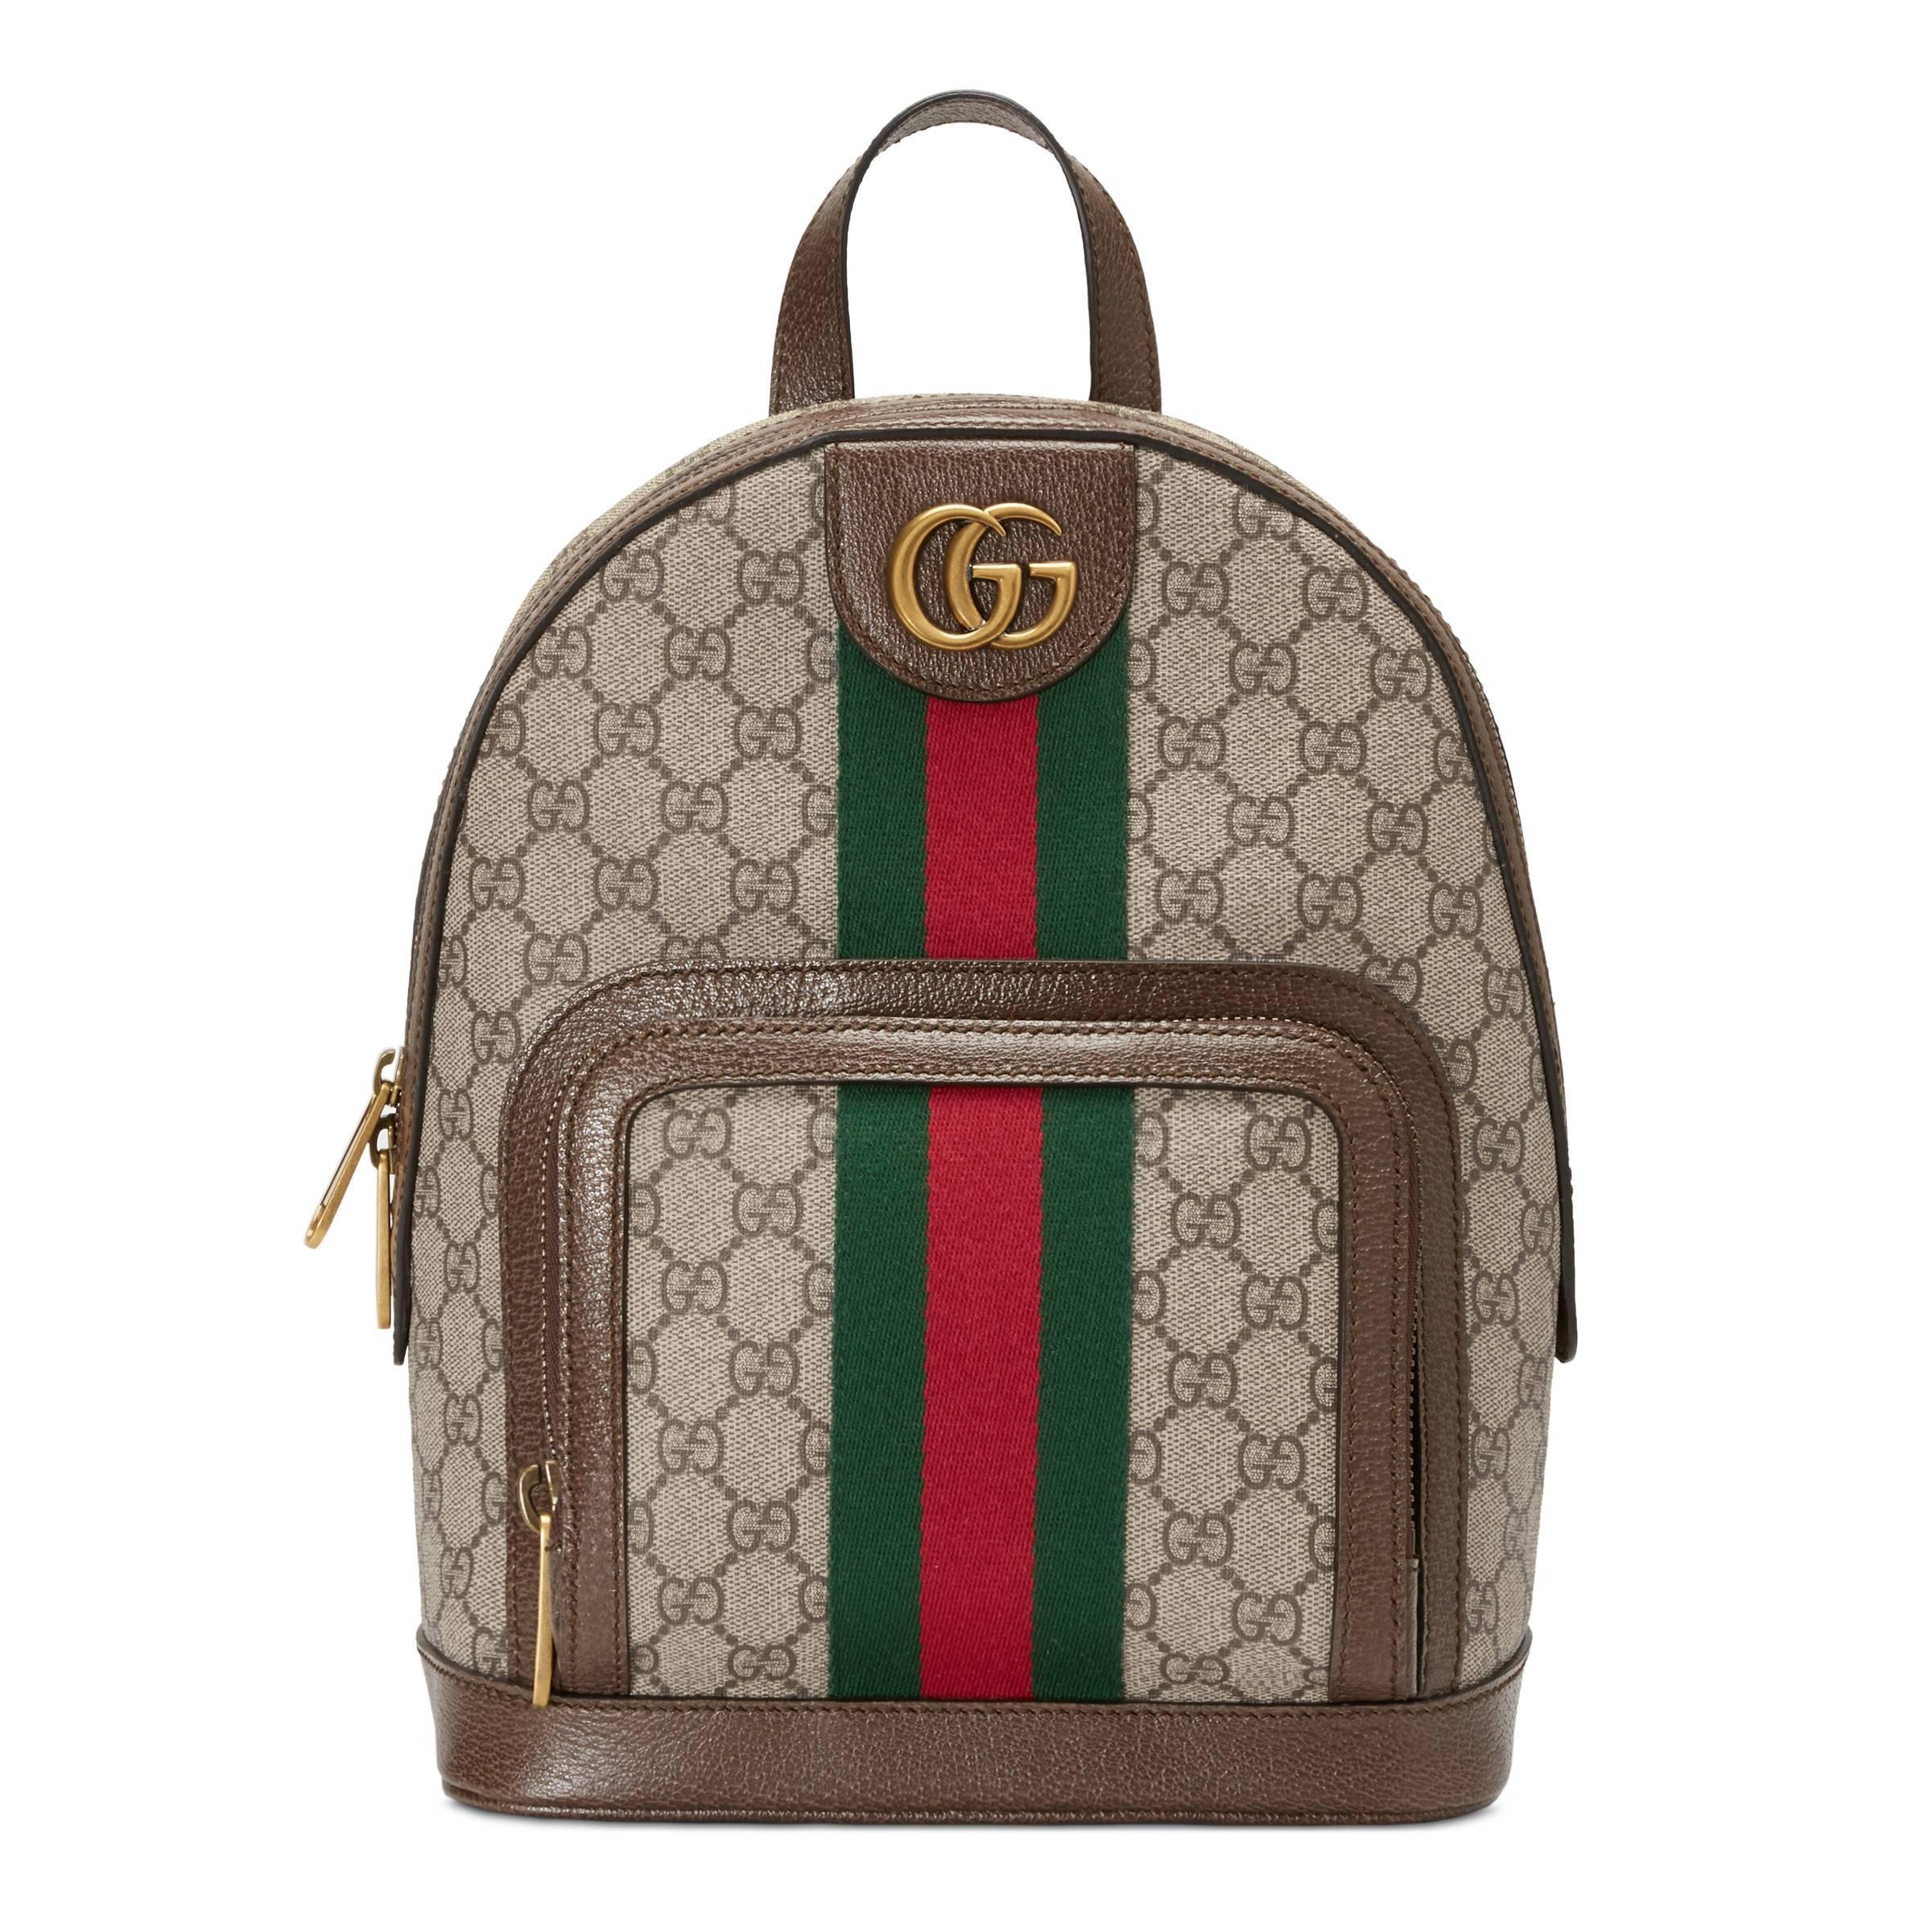 91a39d0dd7 Mochila Ophidia Pequeña con GG Gucci - Lyst